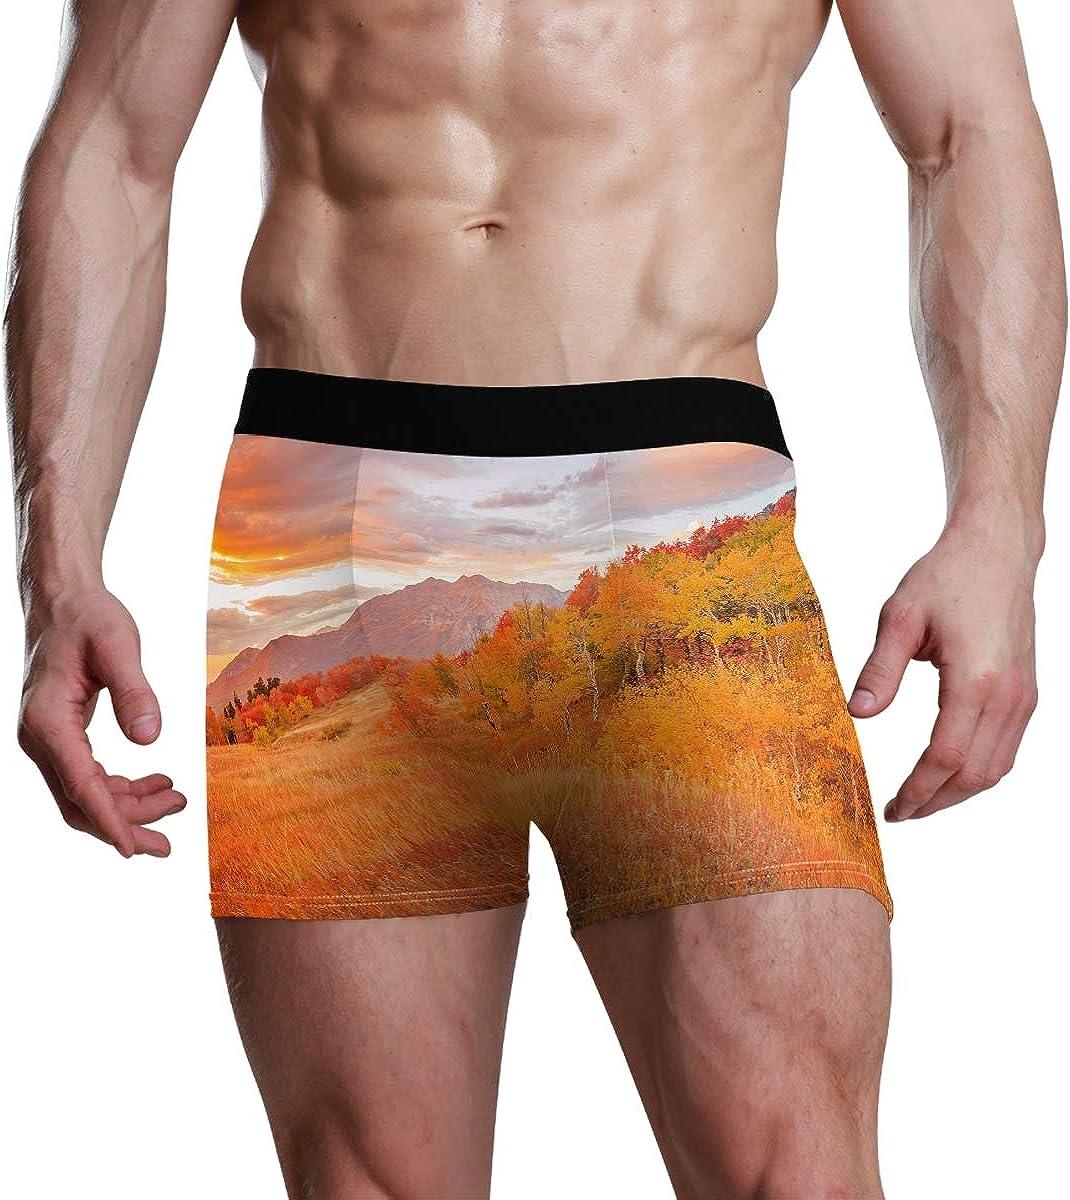 HangWang Mens Underwear Briefs Fall Forest Tree Autumn Breathable Long Boxer Briefs Underwear Boys